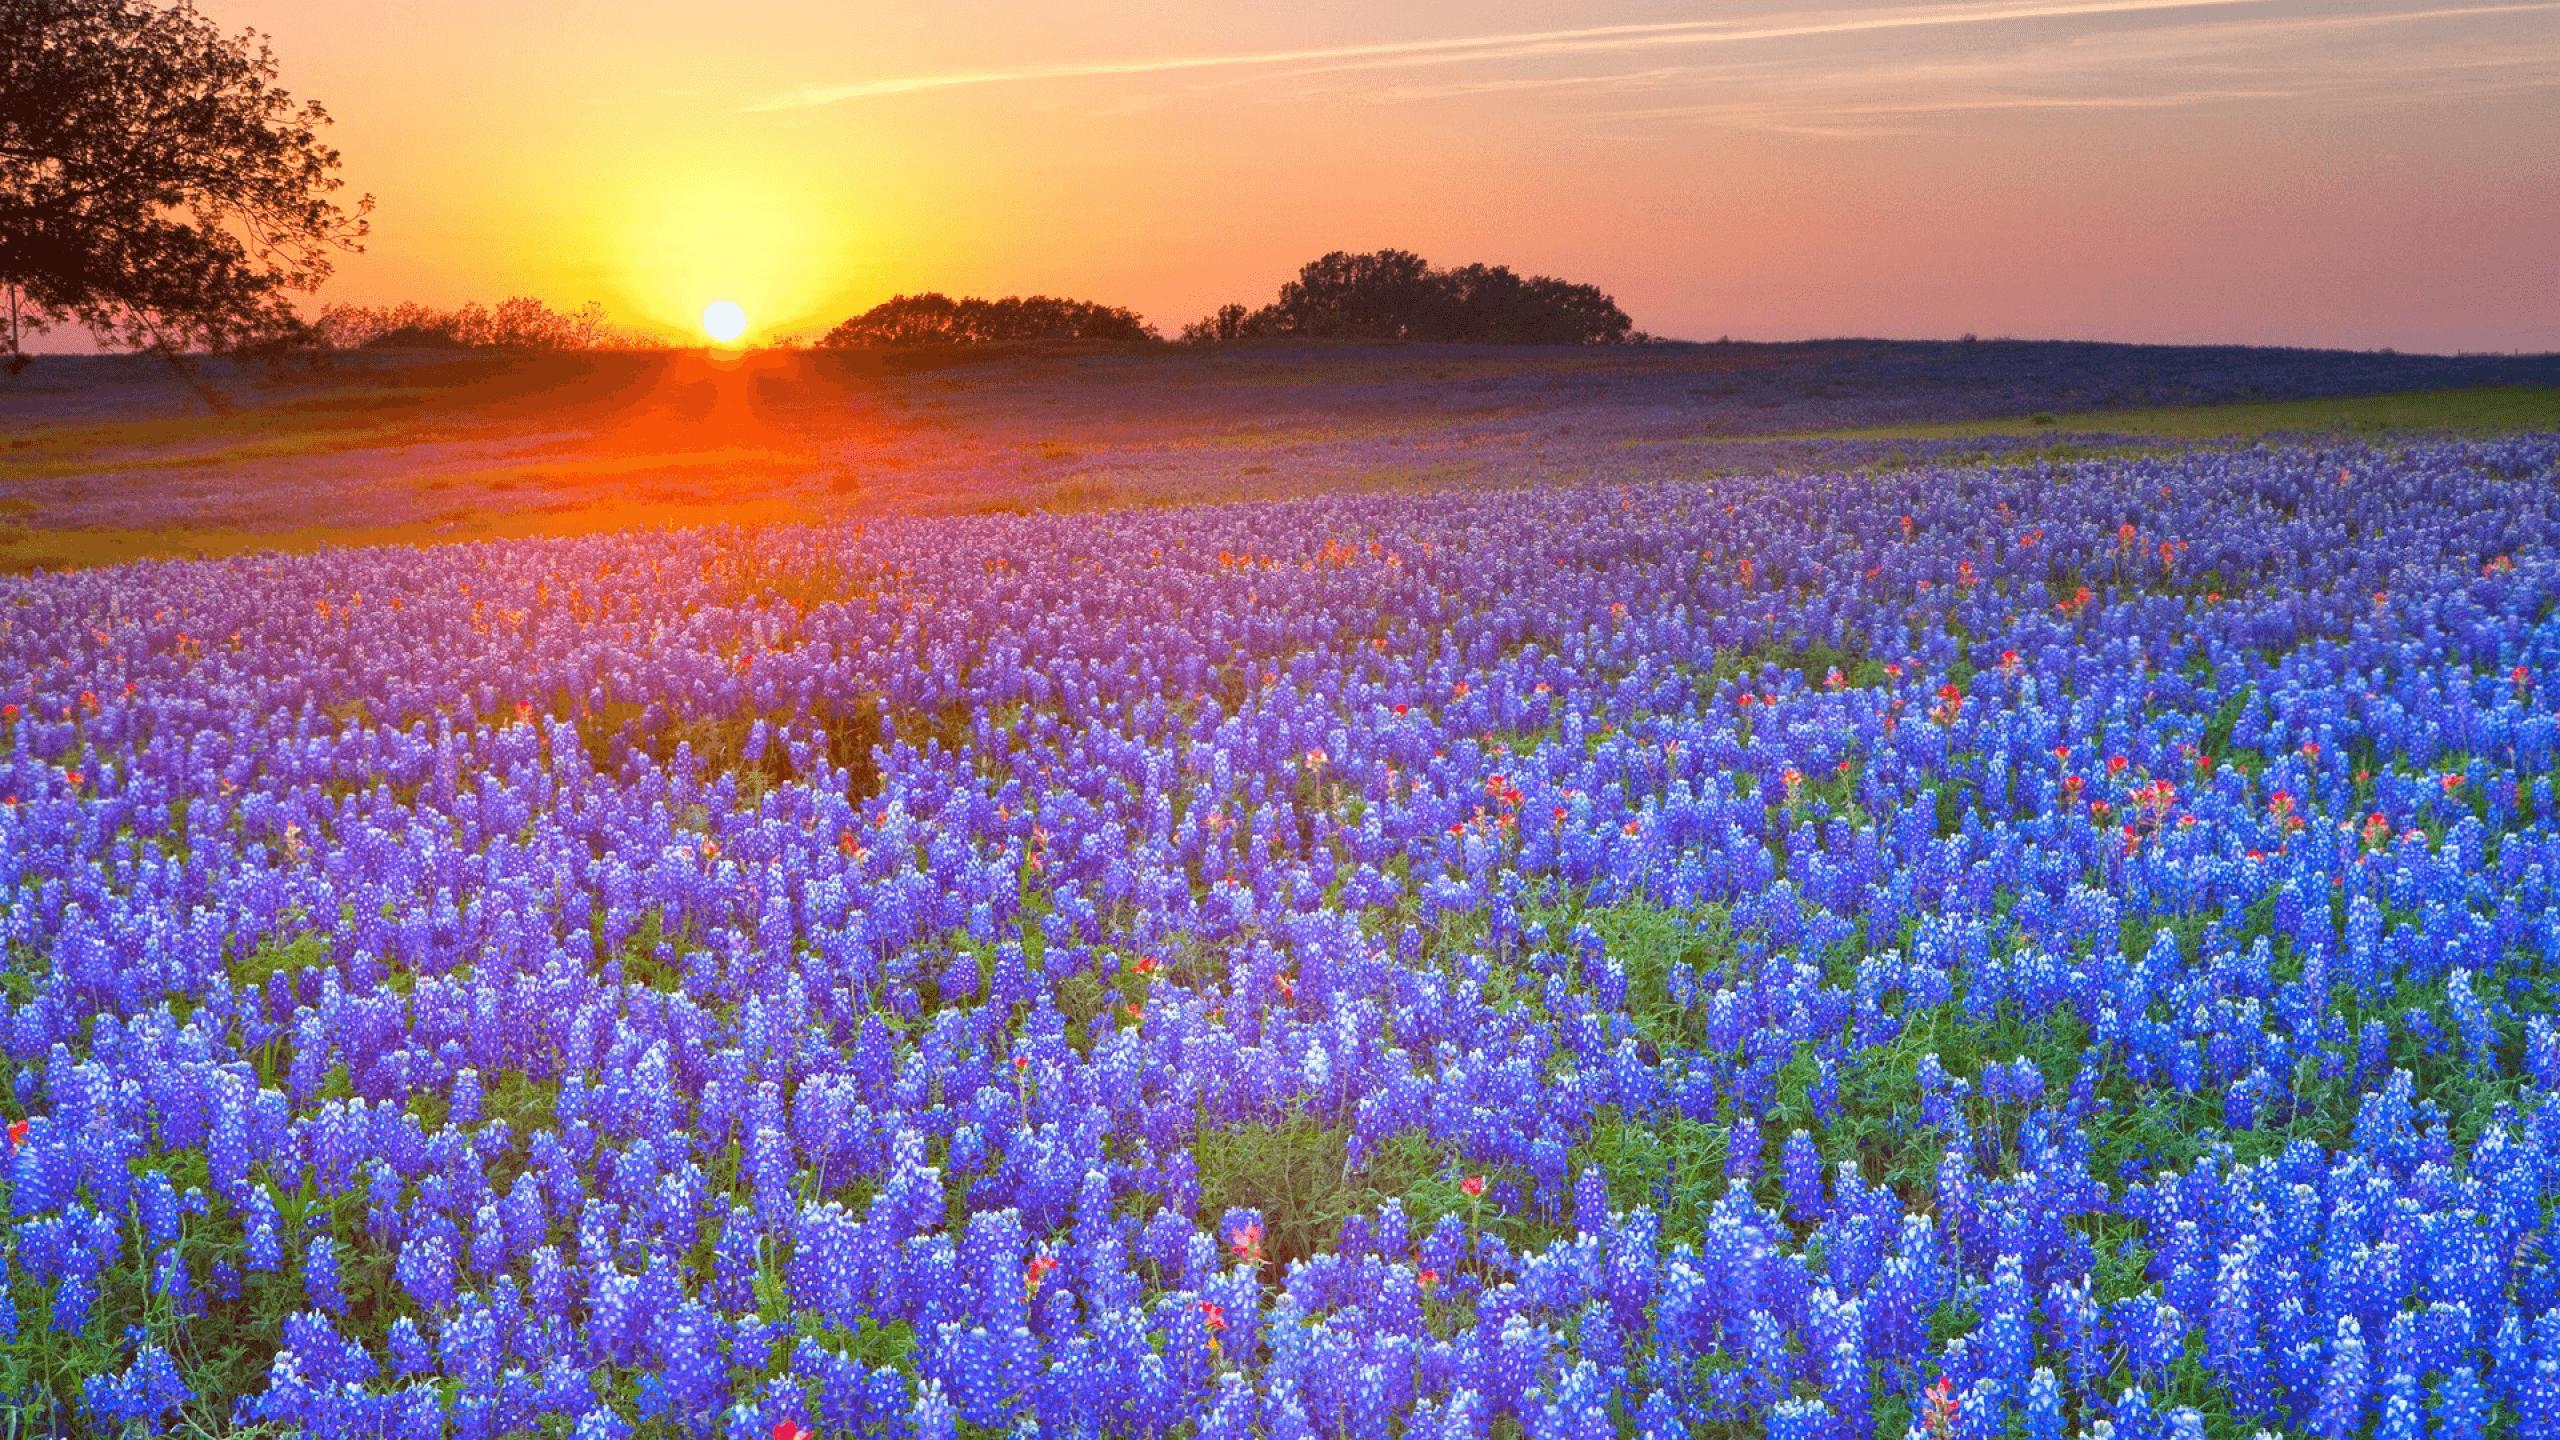 Texas Wallpapers   Top Texas Backgrounds   WallpaperAccess 2560x1440